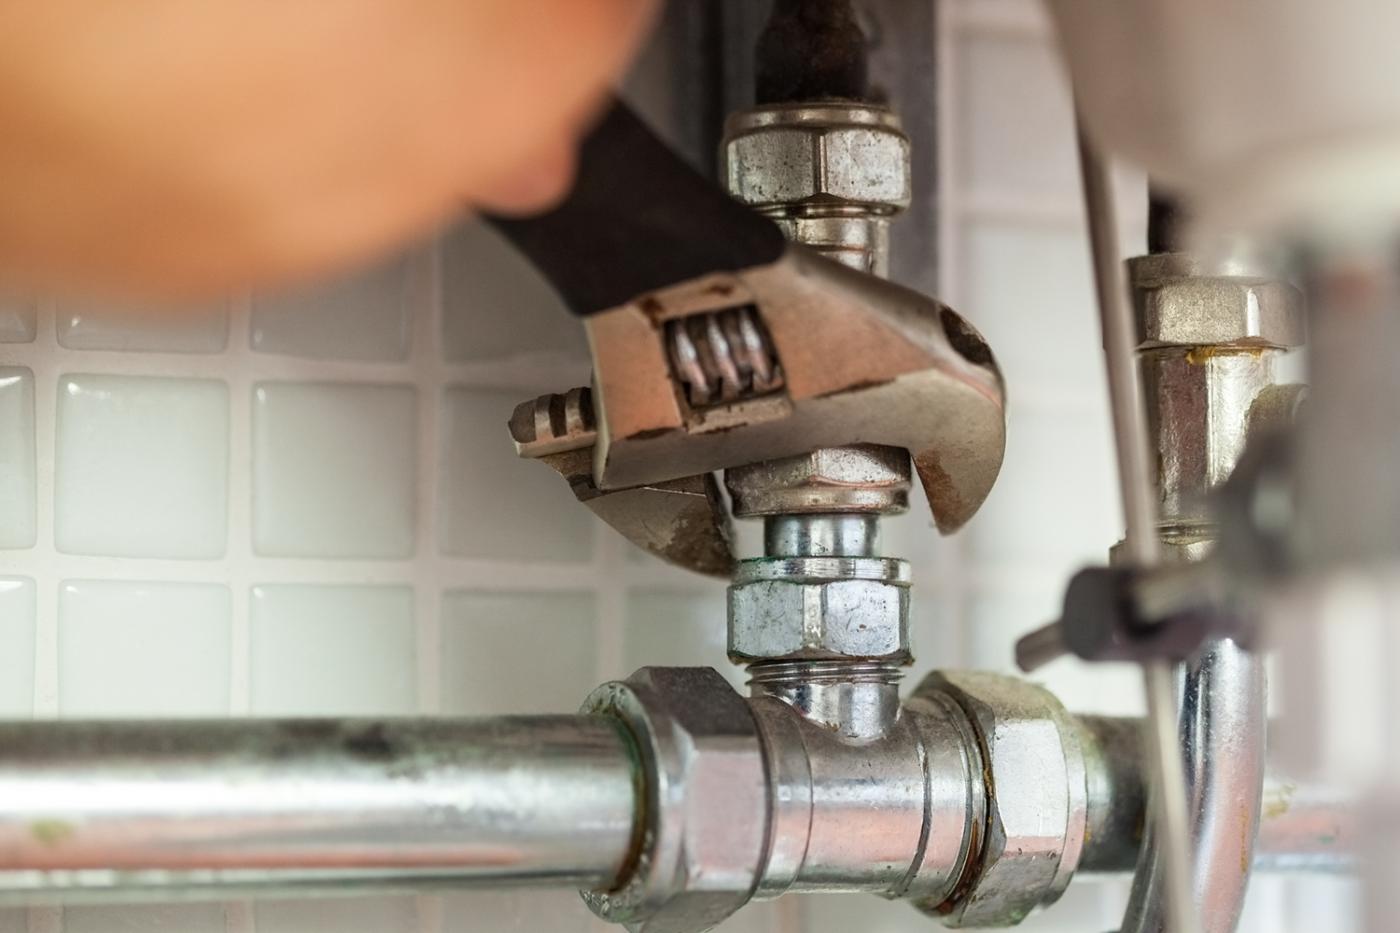 Plumbing hand repairing pipe